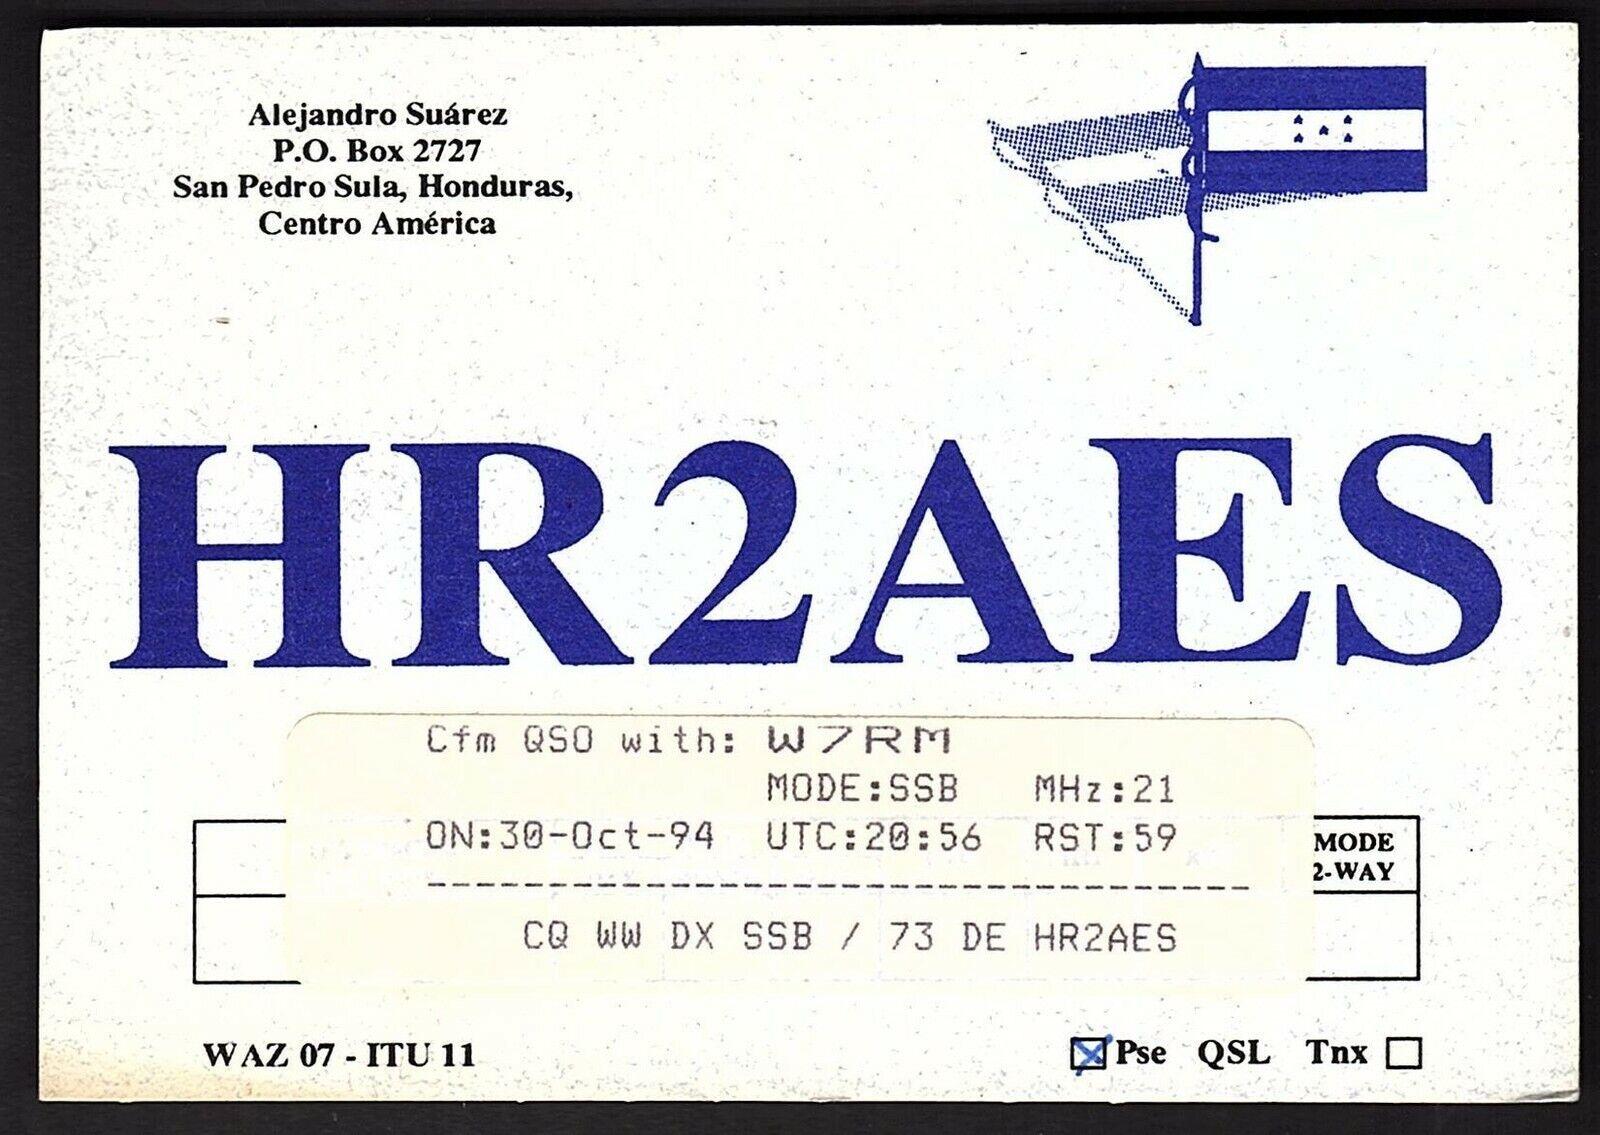 QSL QSO RADIO CARD HR2AES/Alejandro Suarez, Honduras, Centro America (Q2151)